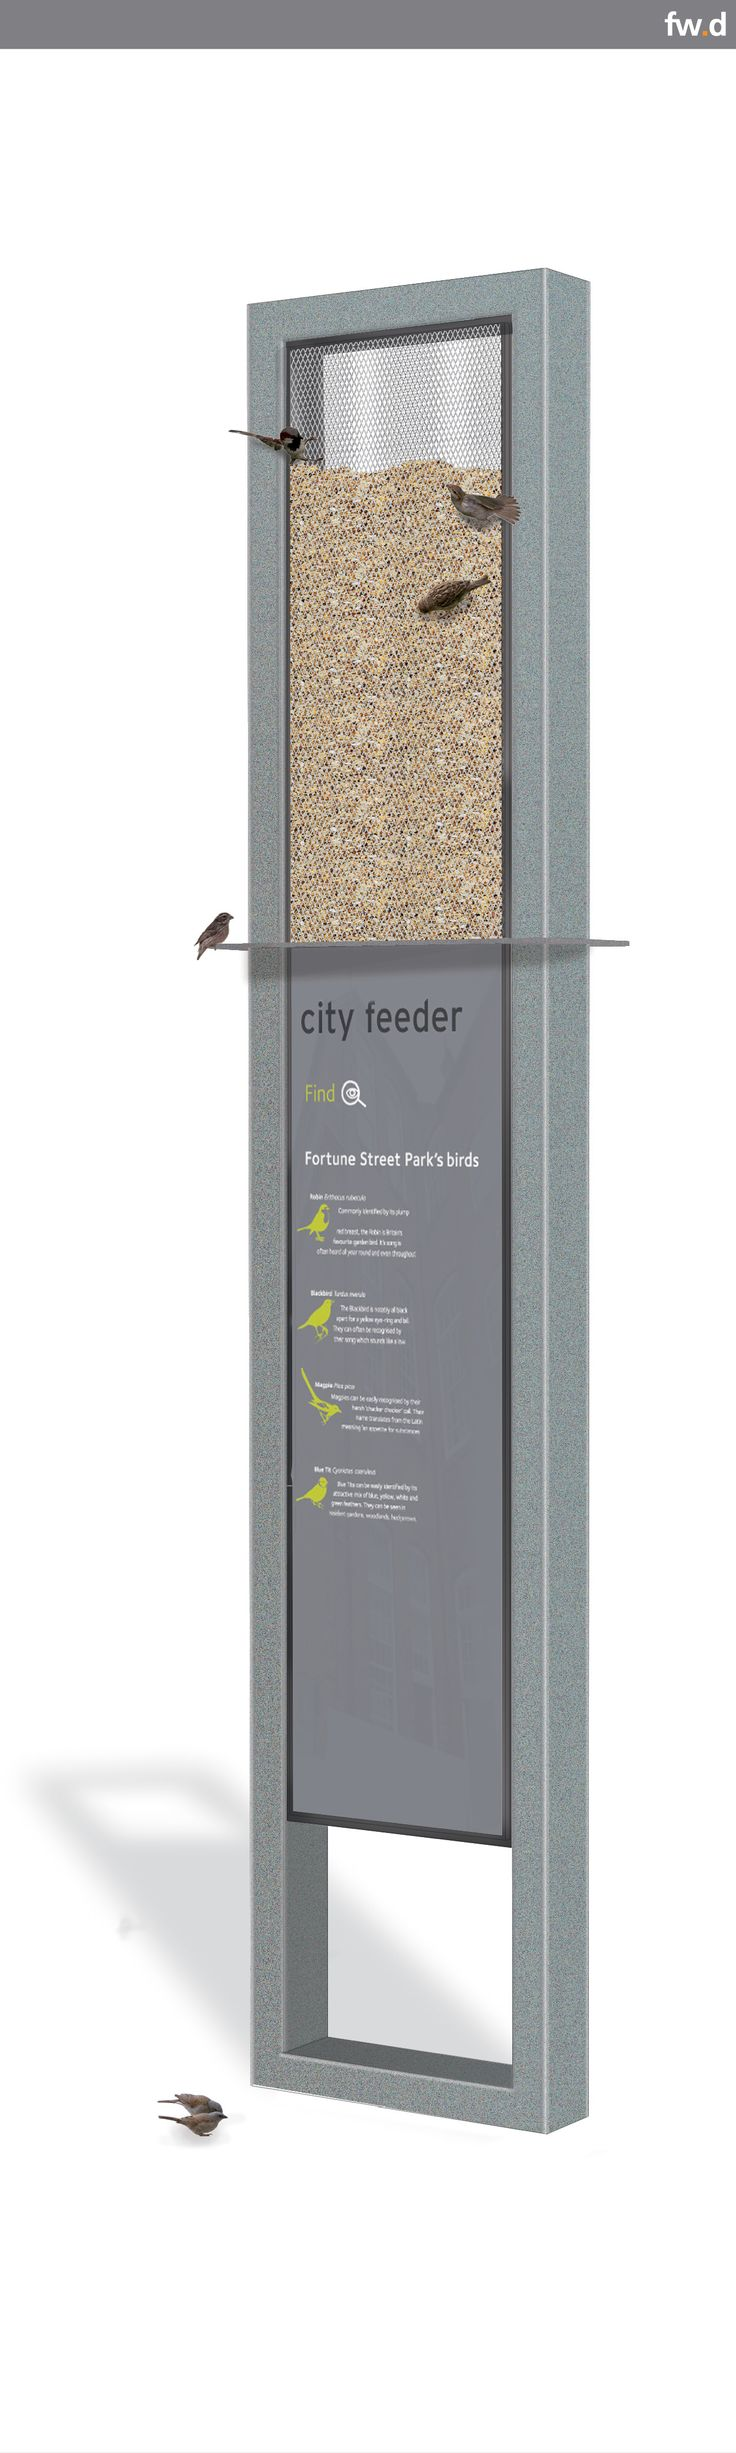 frank city bird feeder by fwdesign